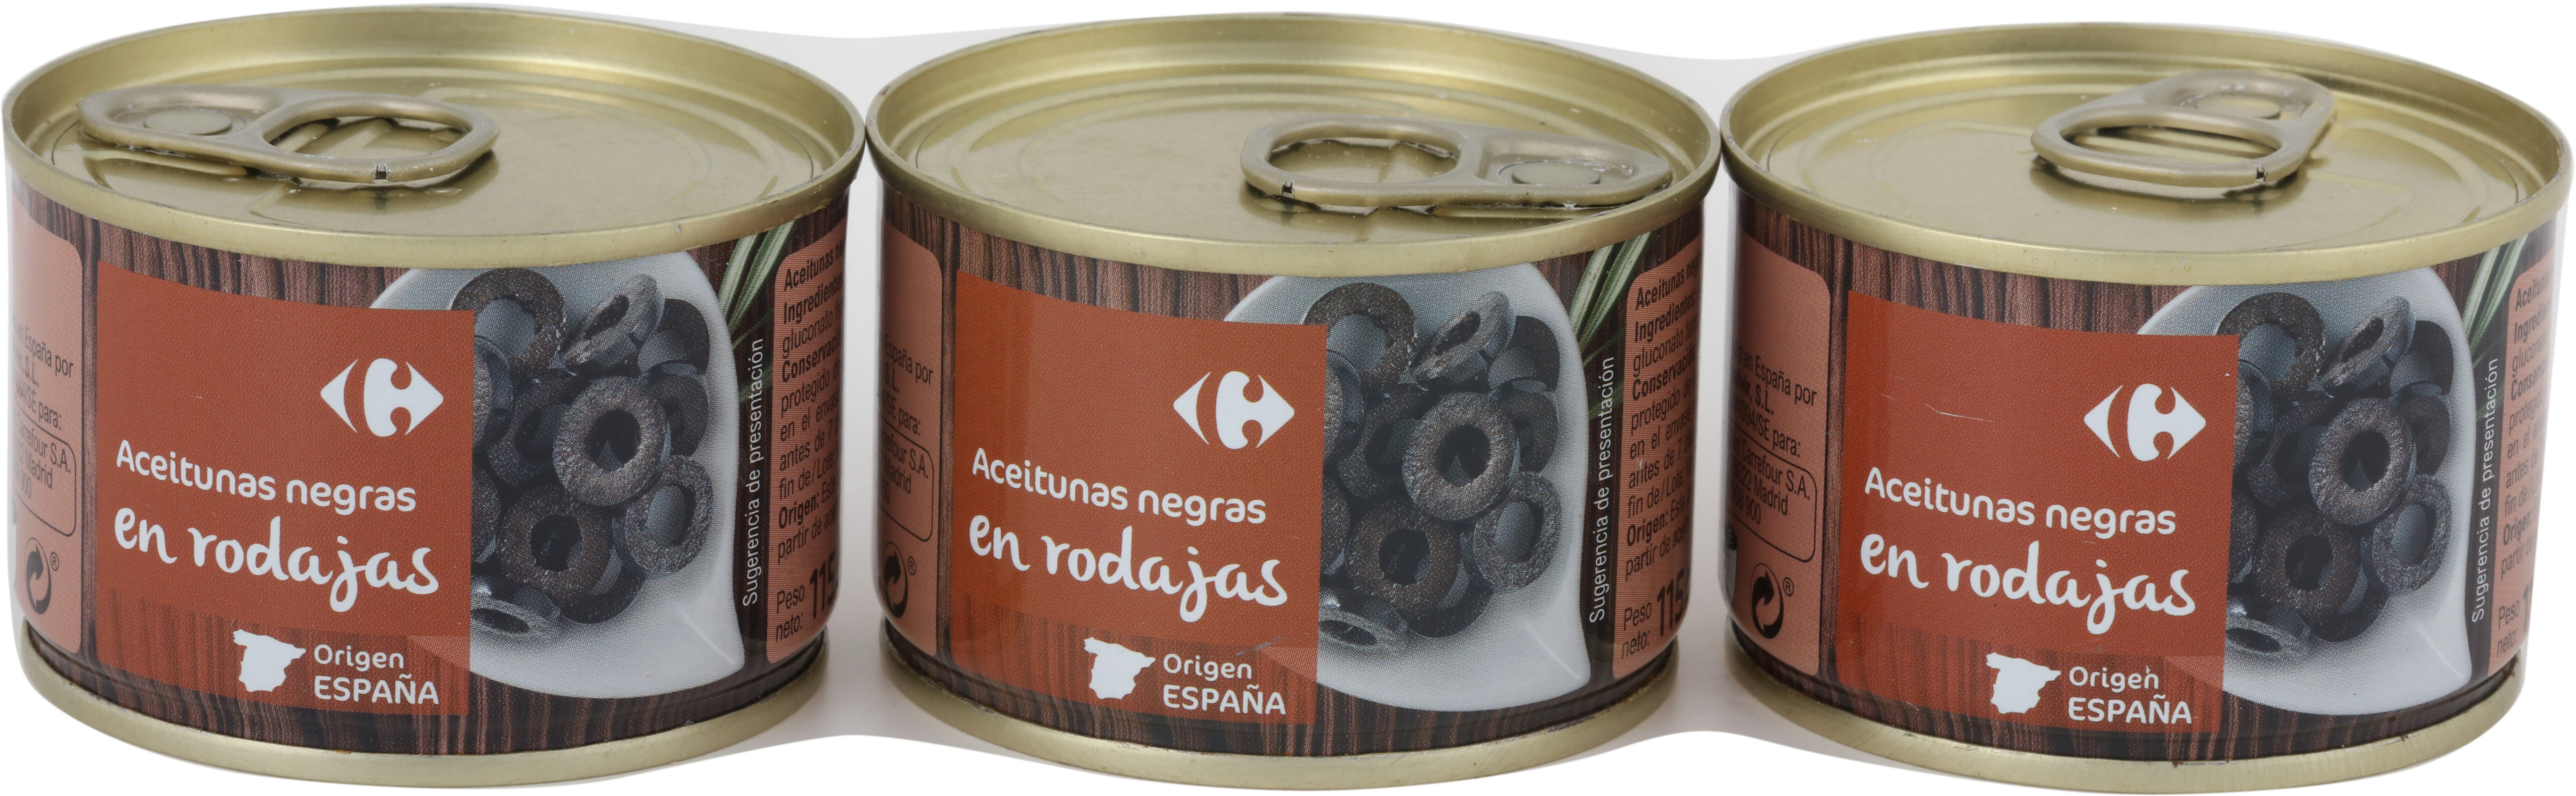 Aceitunas Neg.Cac. Rodajas Lata - Producte - es